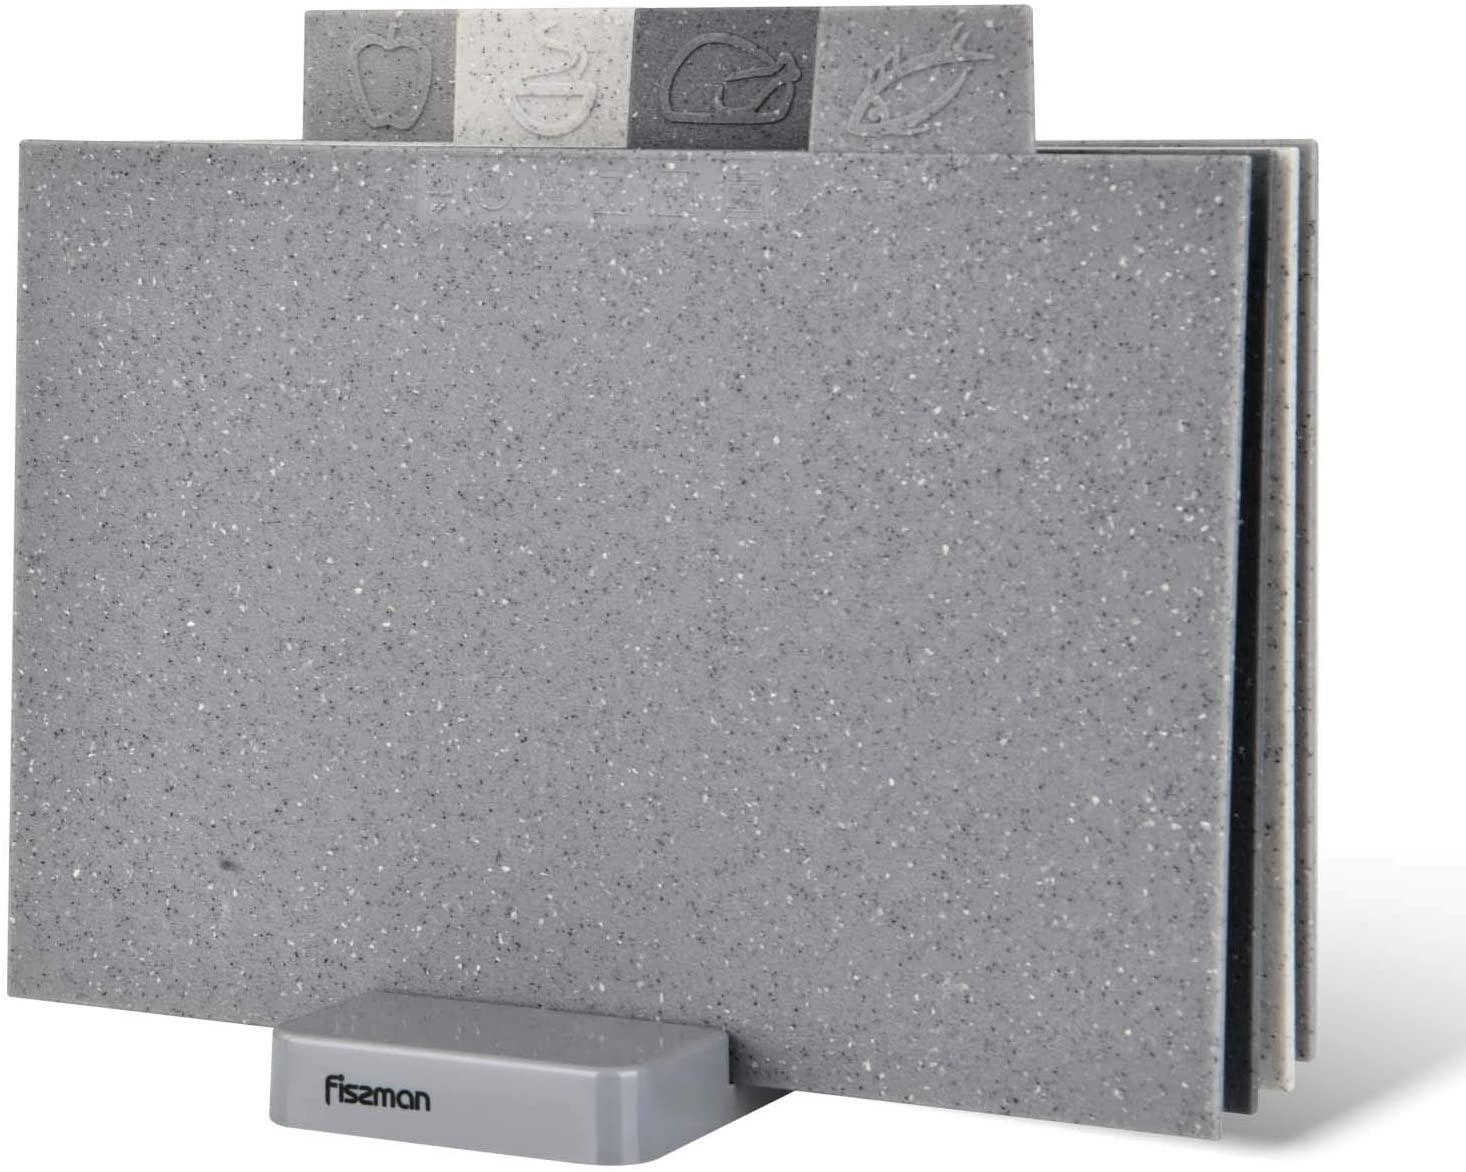 Fissman Anti Bacterium Plastic Cutting Board Non-slip Marble Coating Plastic Mats with Stand